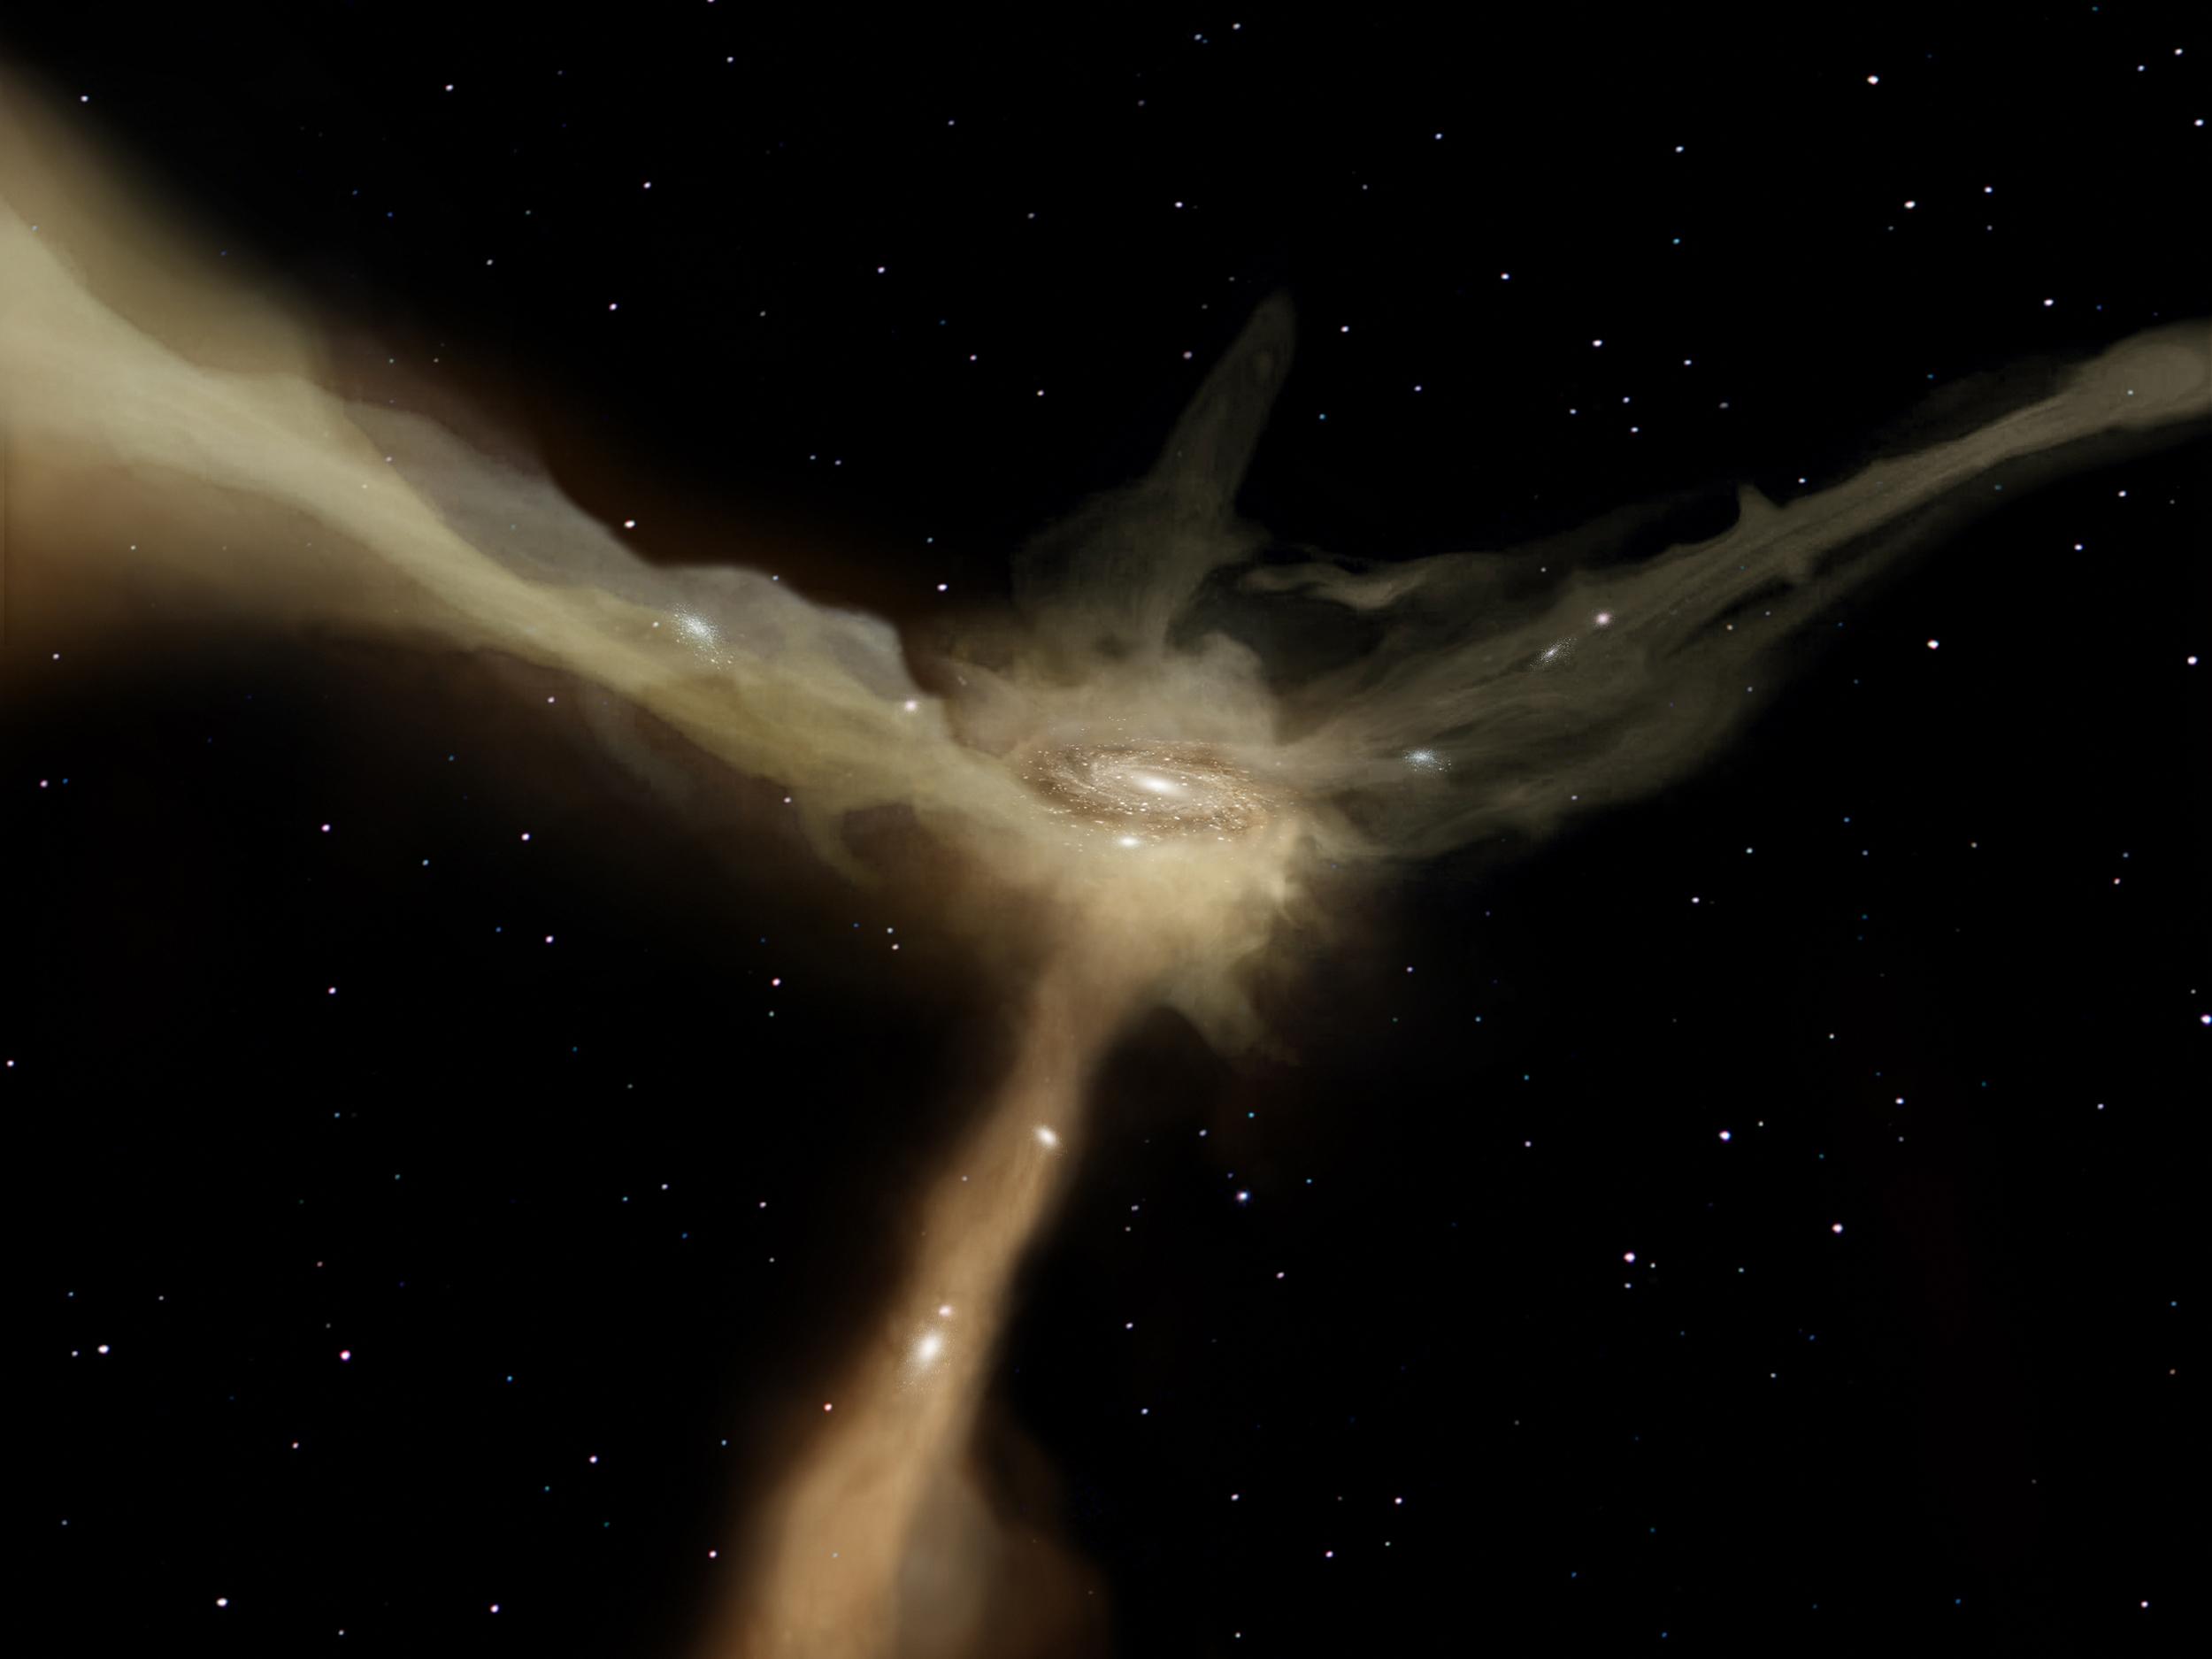 1567216845493-Galaxy_and_filaments_original.jpg